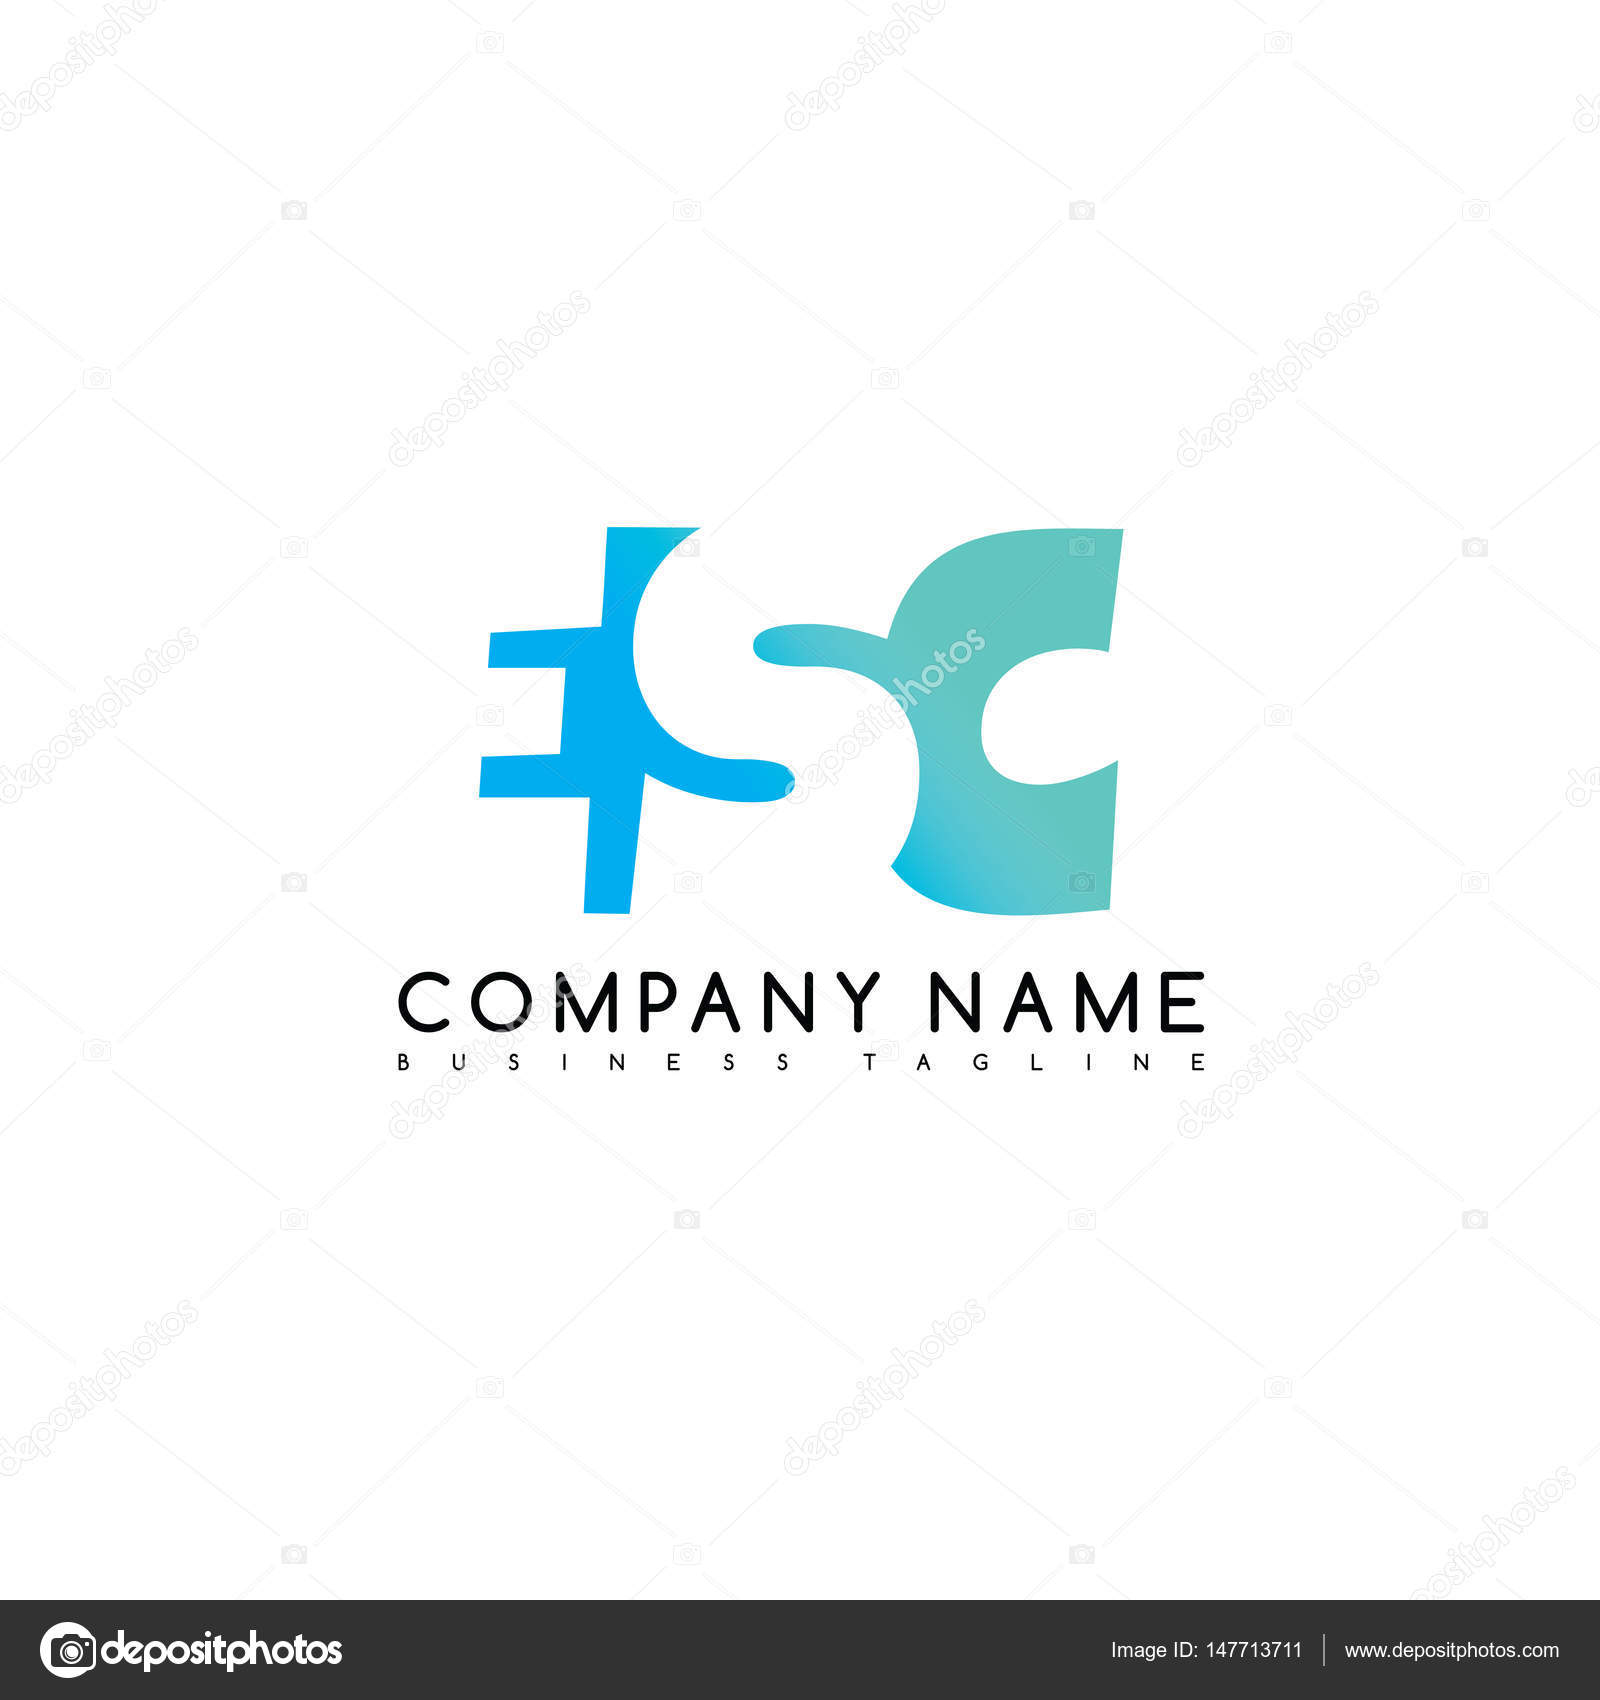 Company name business tagline stock vector vectorfirst 147713711 company name business tagline stock vector buycottarizona